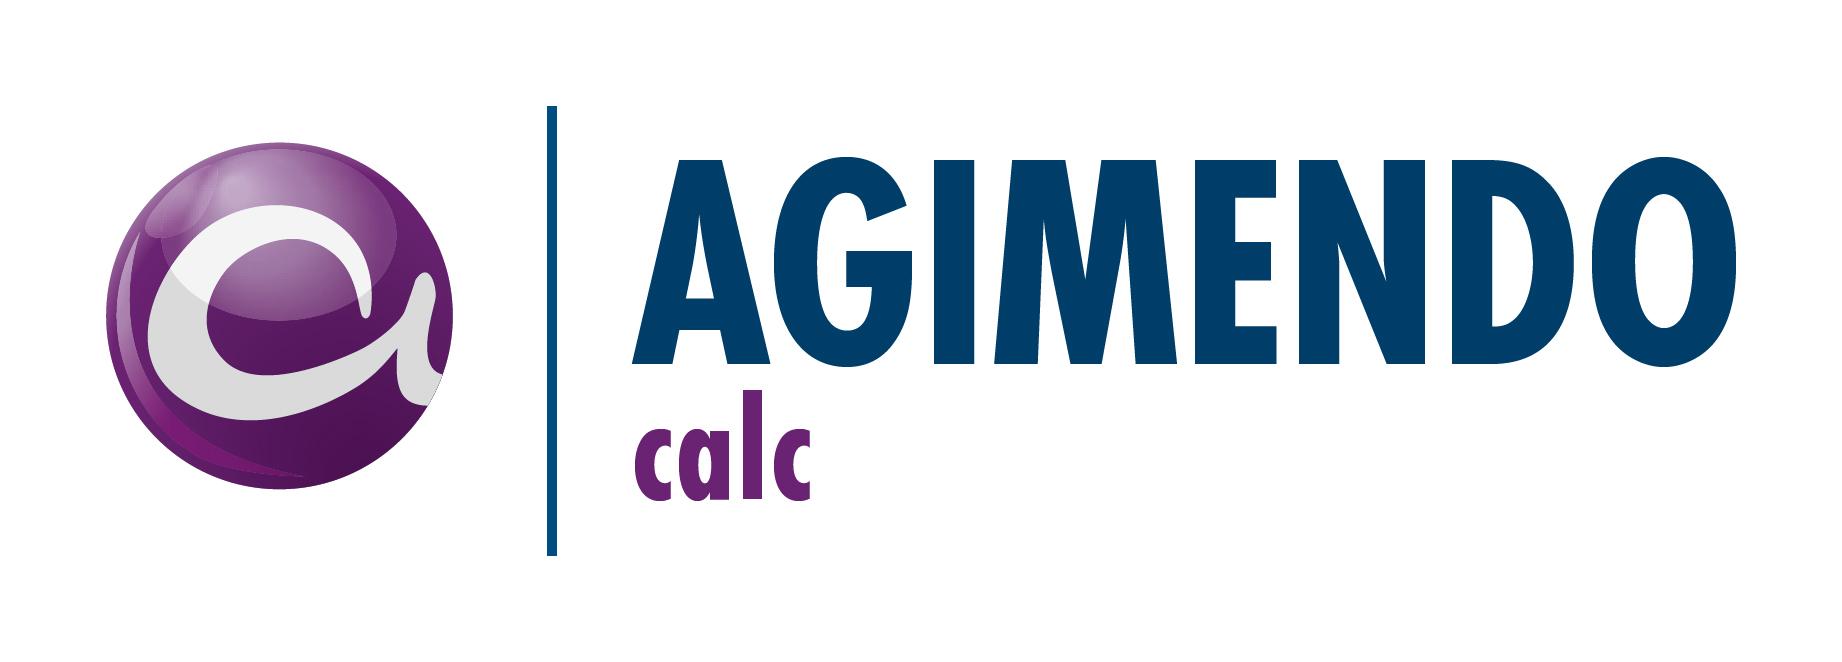 AGIMENDO.calc_small_frame-freigestellt